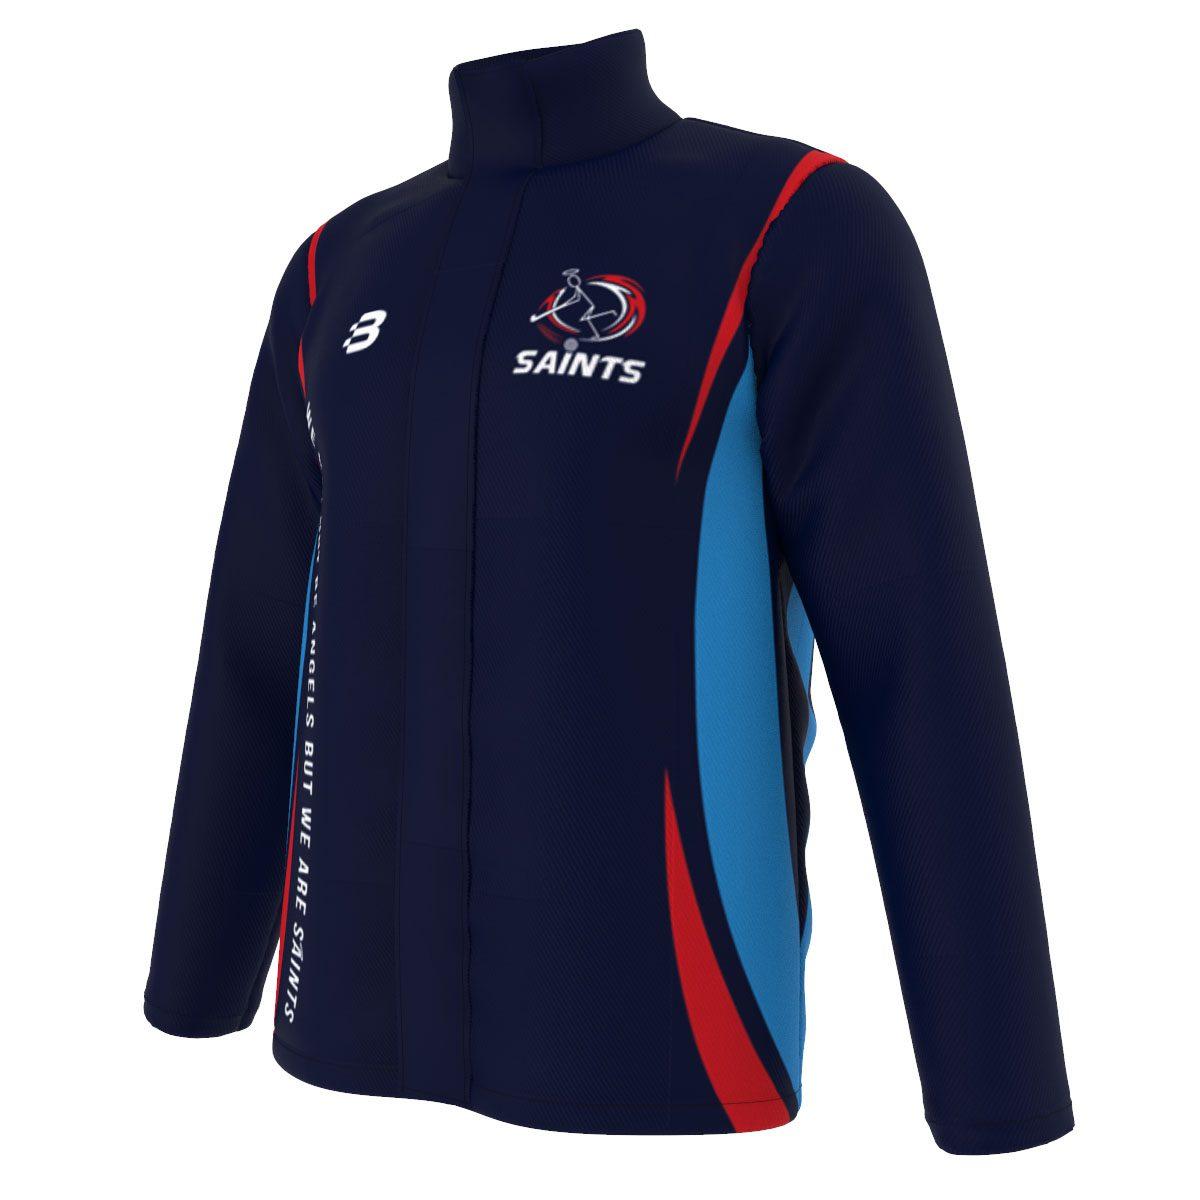 Custom Sublimated Hockey Stadium Jackets - Your Design, Unlimited Colours and Logos